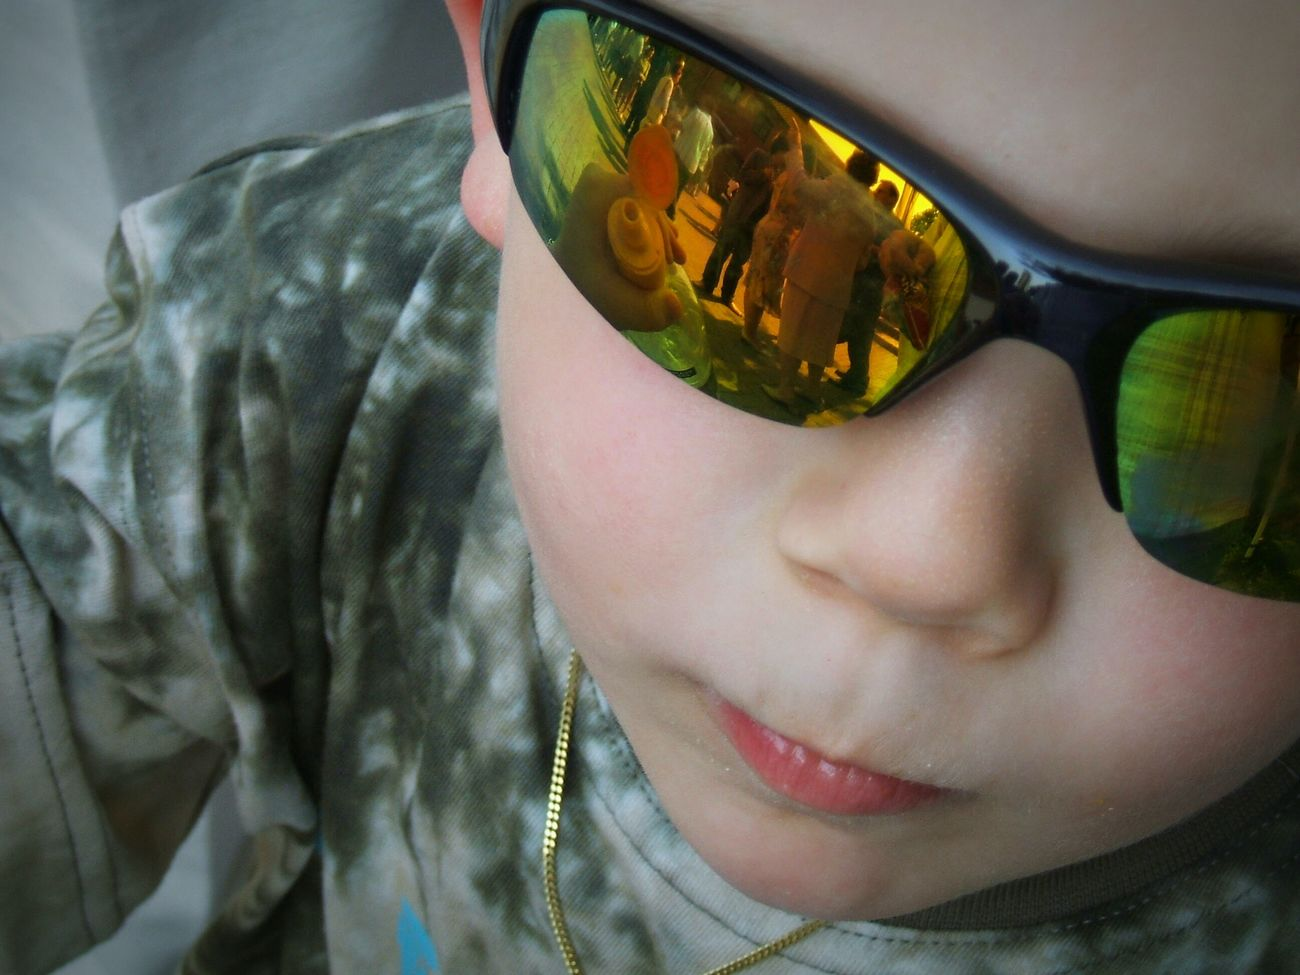 My Son Junge Boy Mein Ganzer Stolz ! Nice Day Cool EyeEmBestPics Peoplephotography Germany Eye4photography